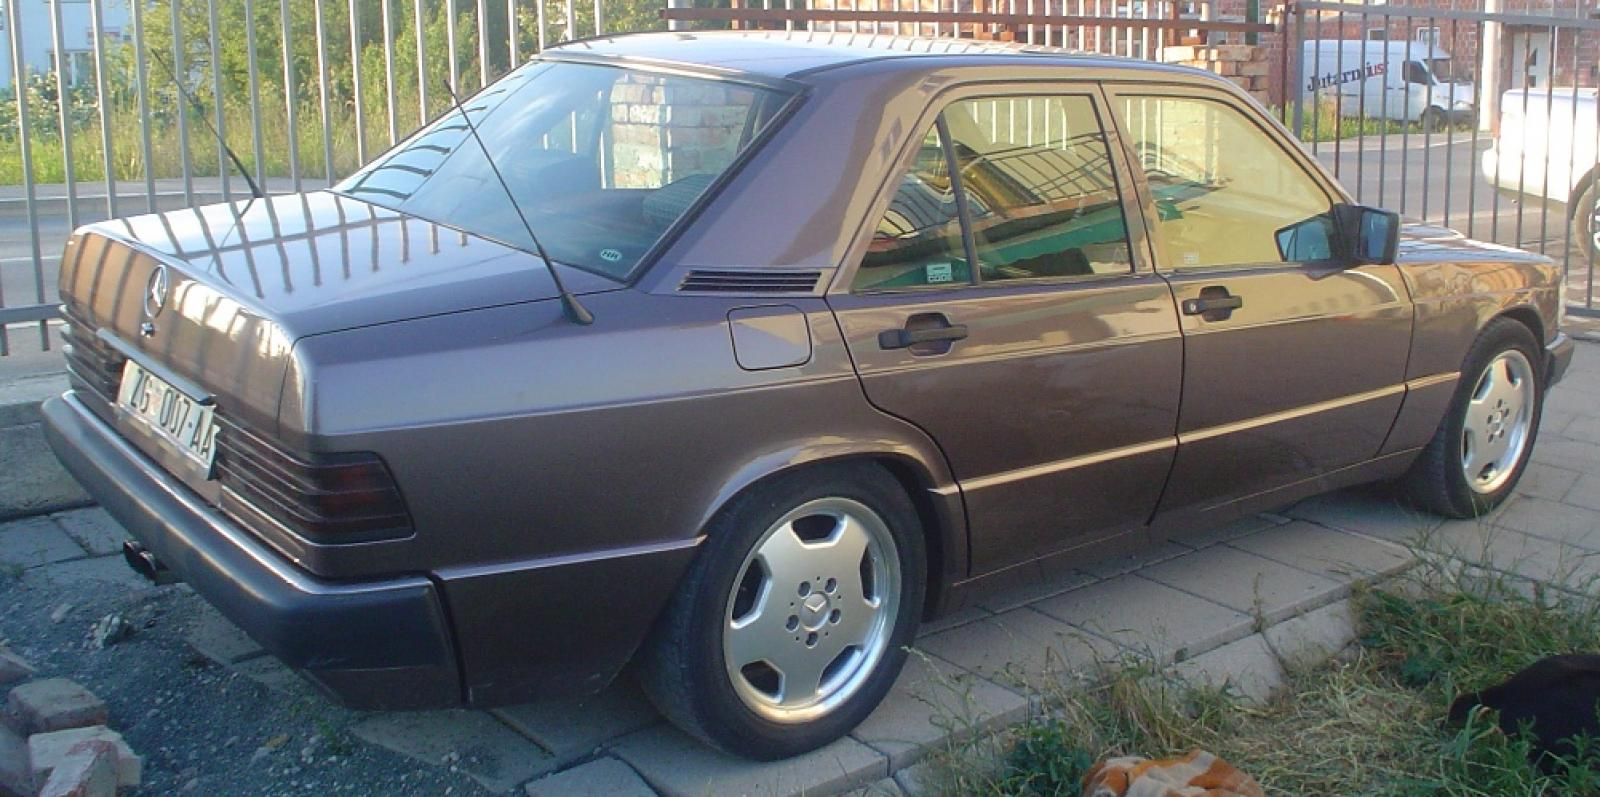 1992 mercedes benz 190 class information and photos for Mercedes benz 1992